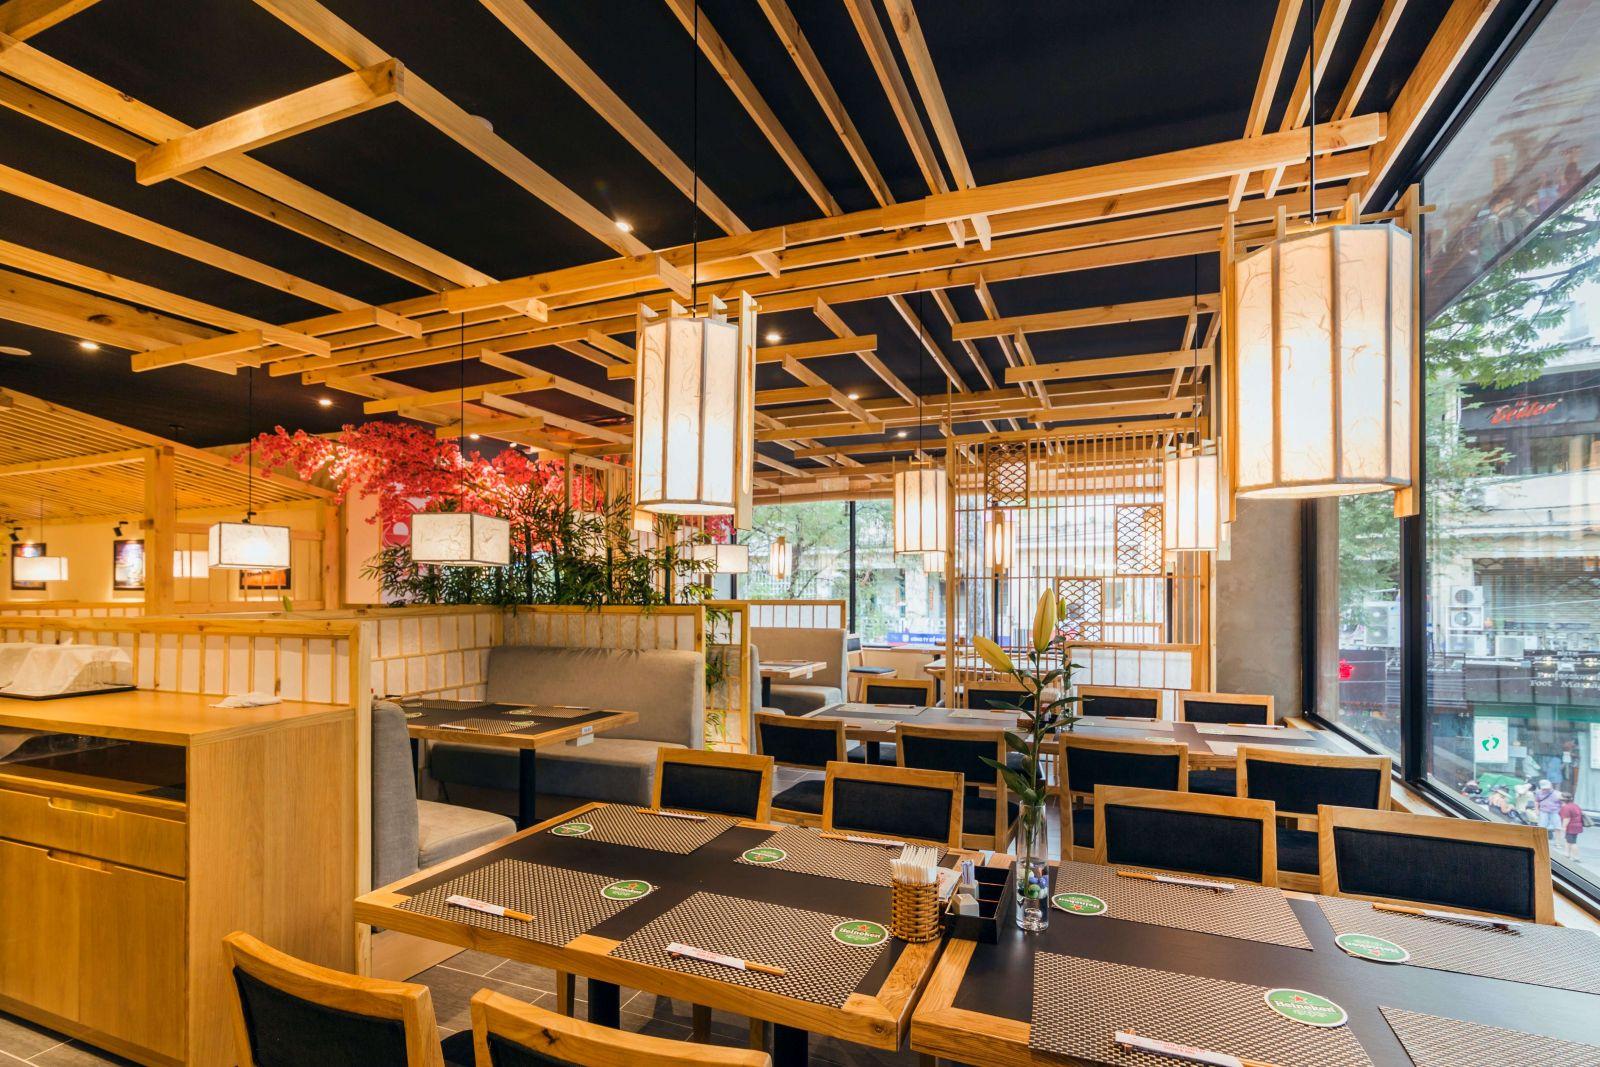 nha-hang-sushi-world-mang-loi-thiet-ke-noi-that-cua-nhat-ban